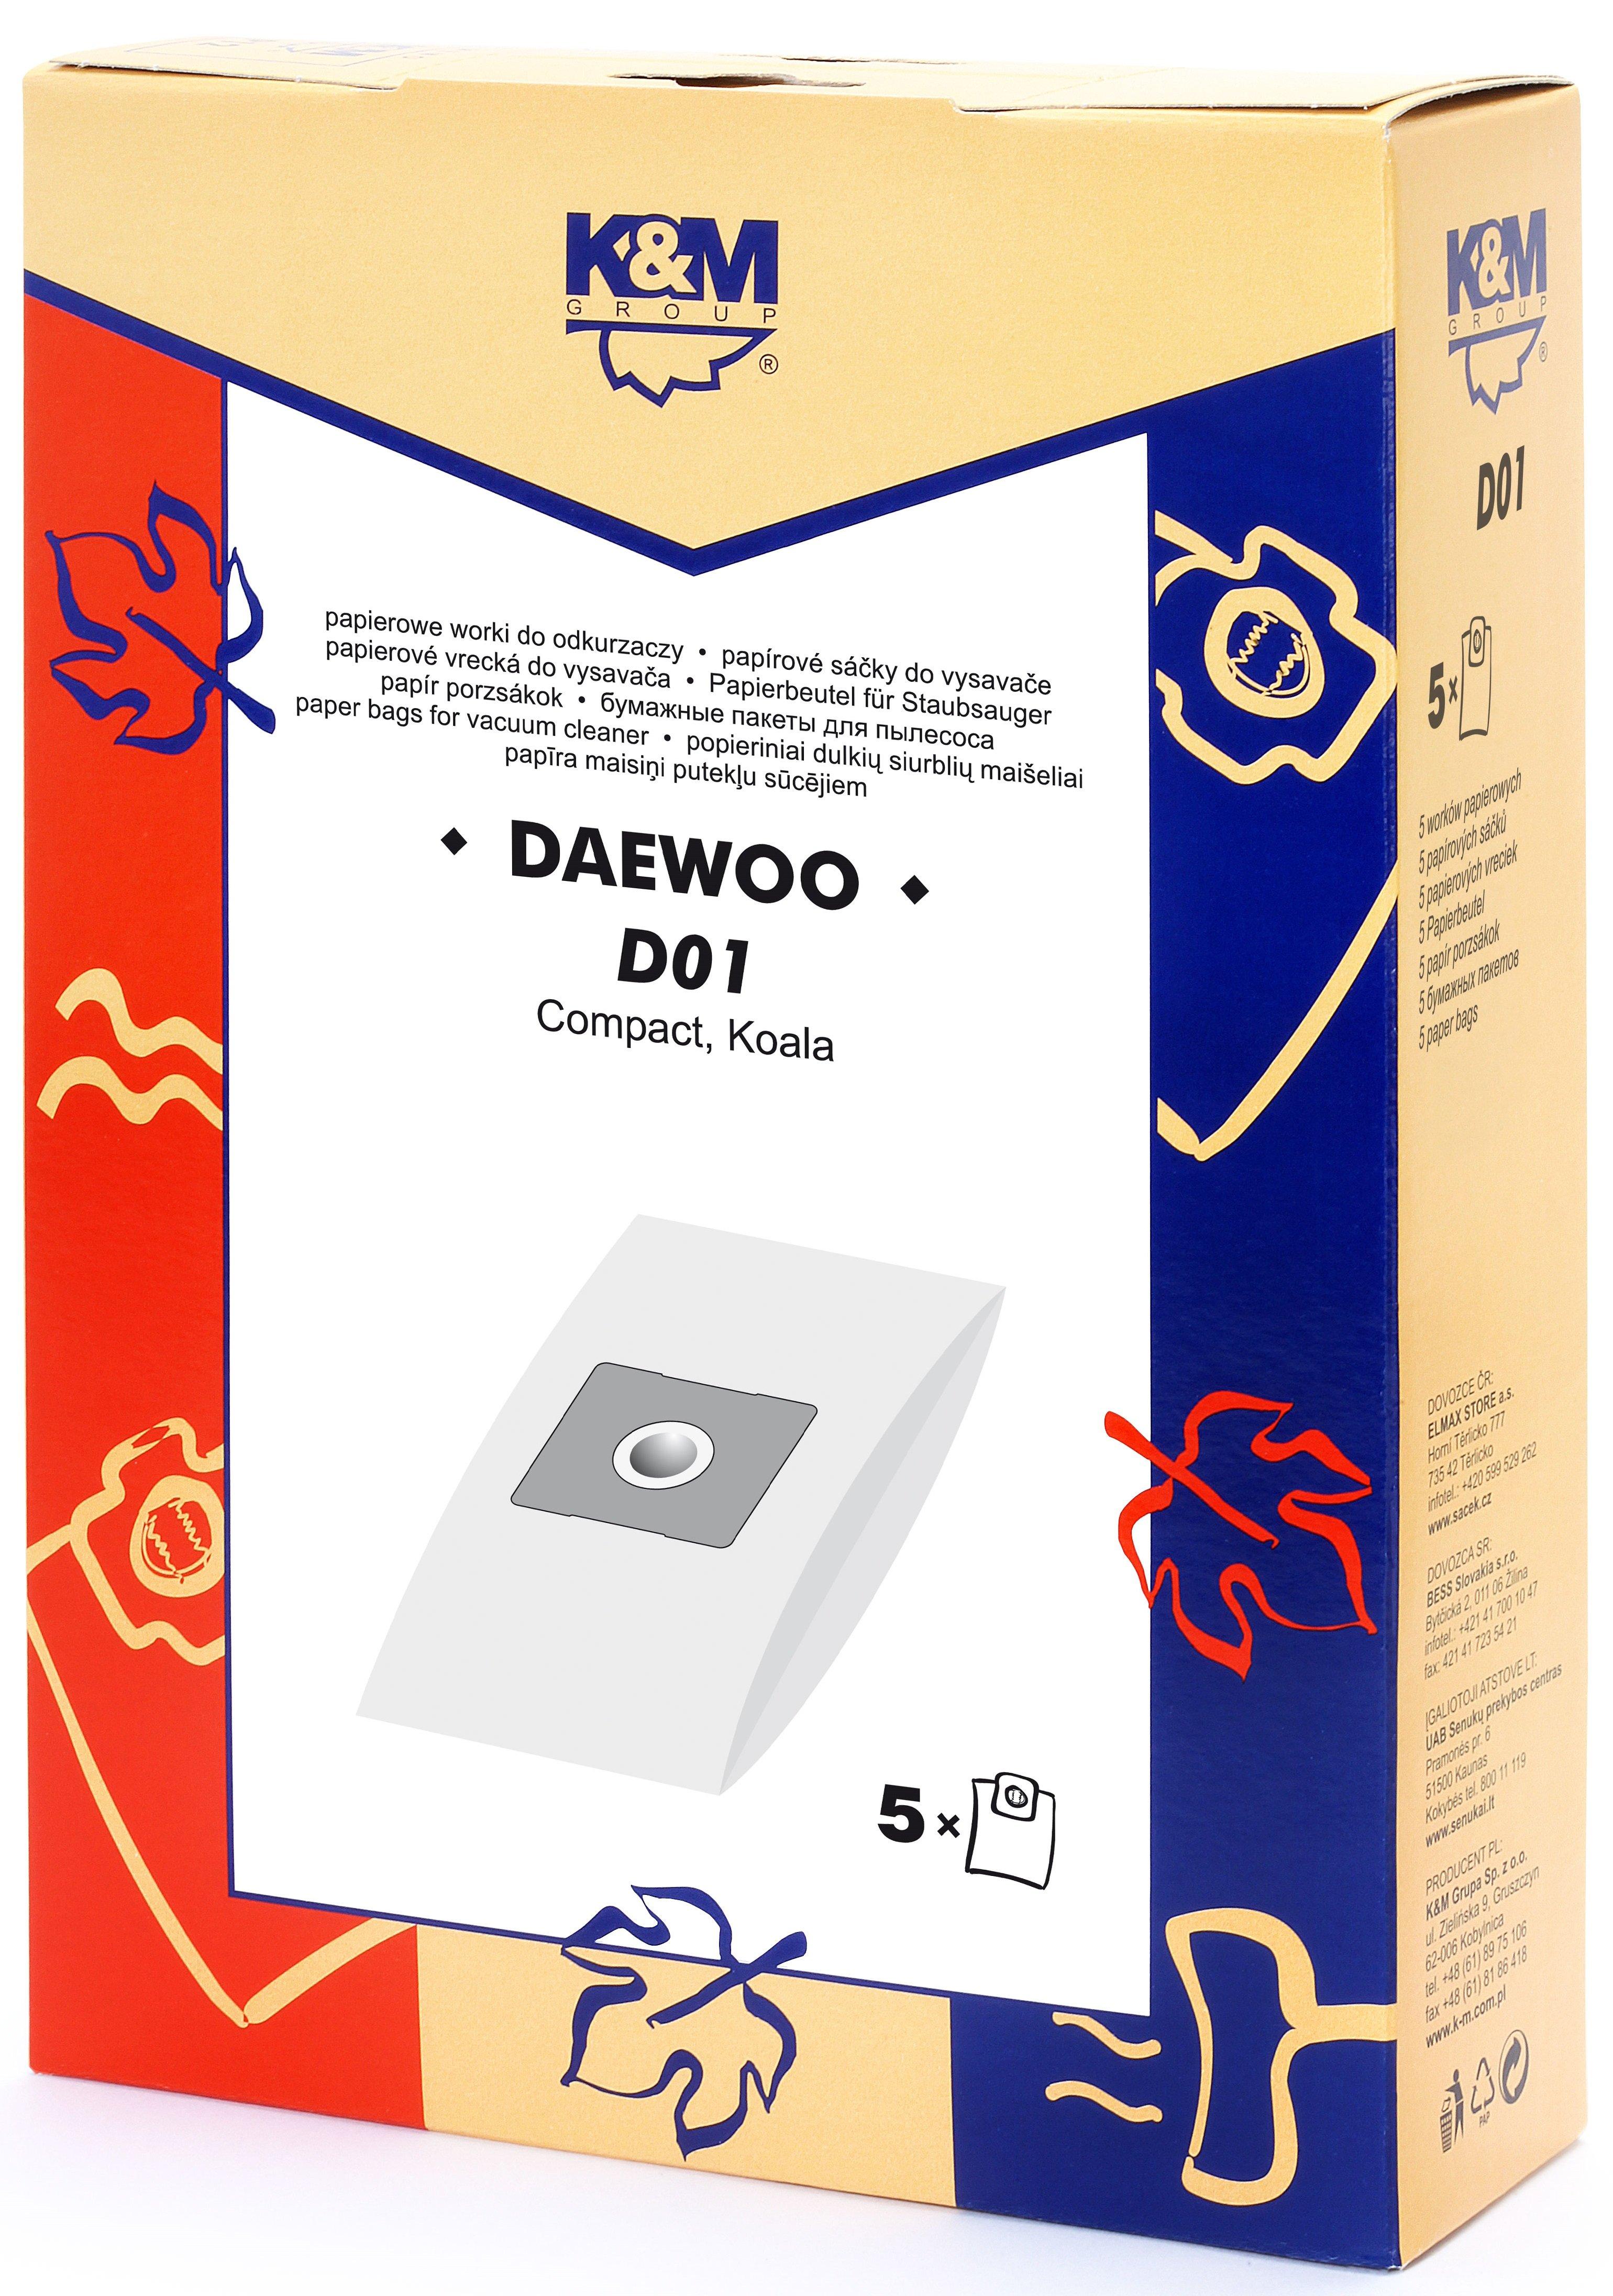 Sac aspirator DAEWOO RC 105/407/705, hartie, 5X saci, K&M 0